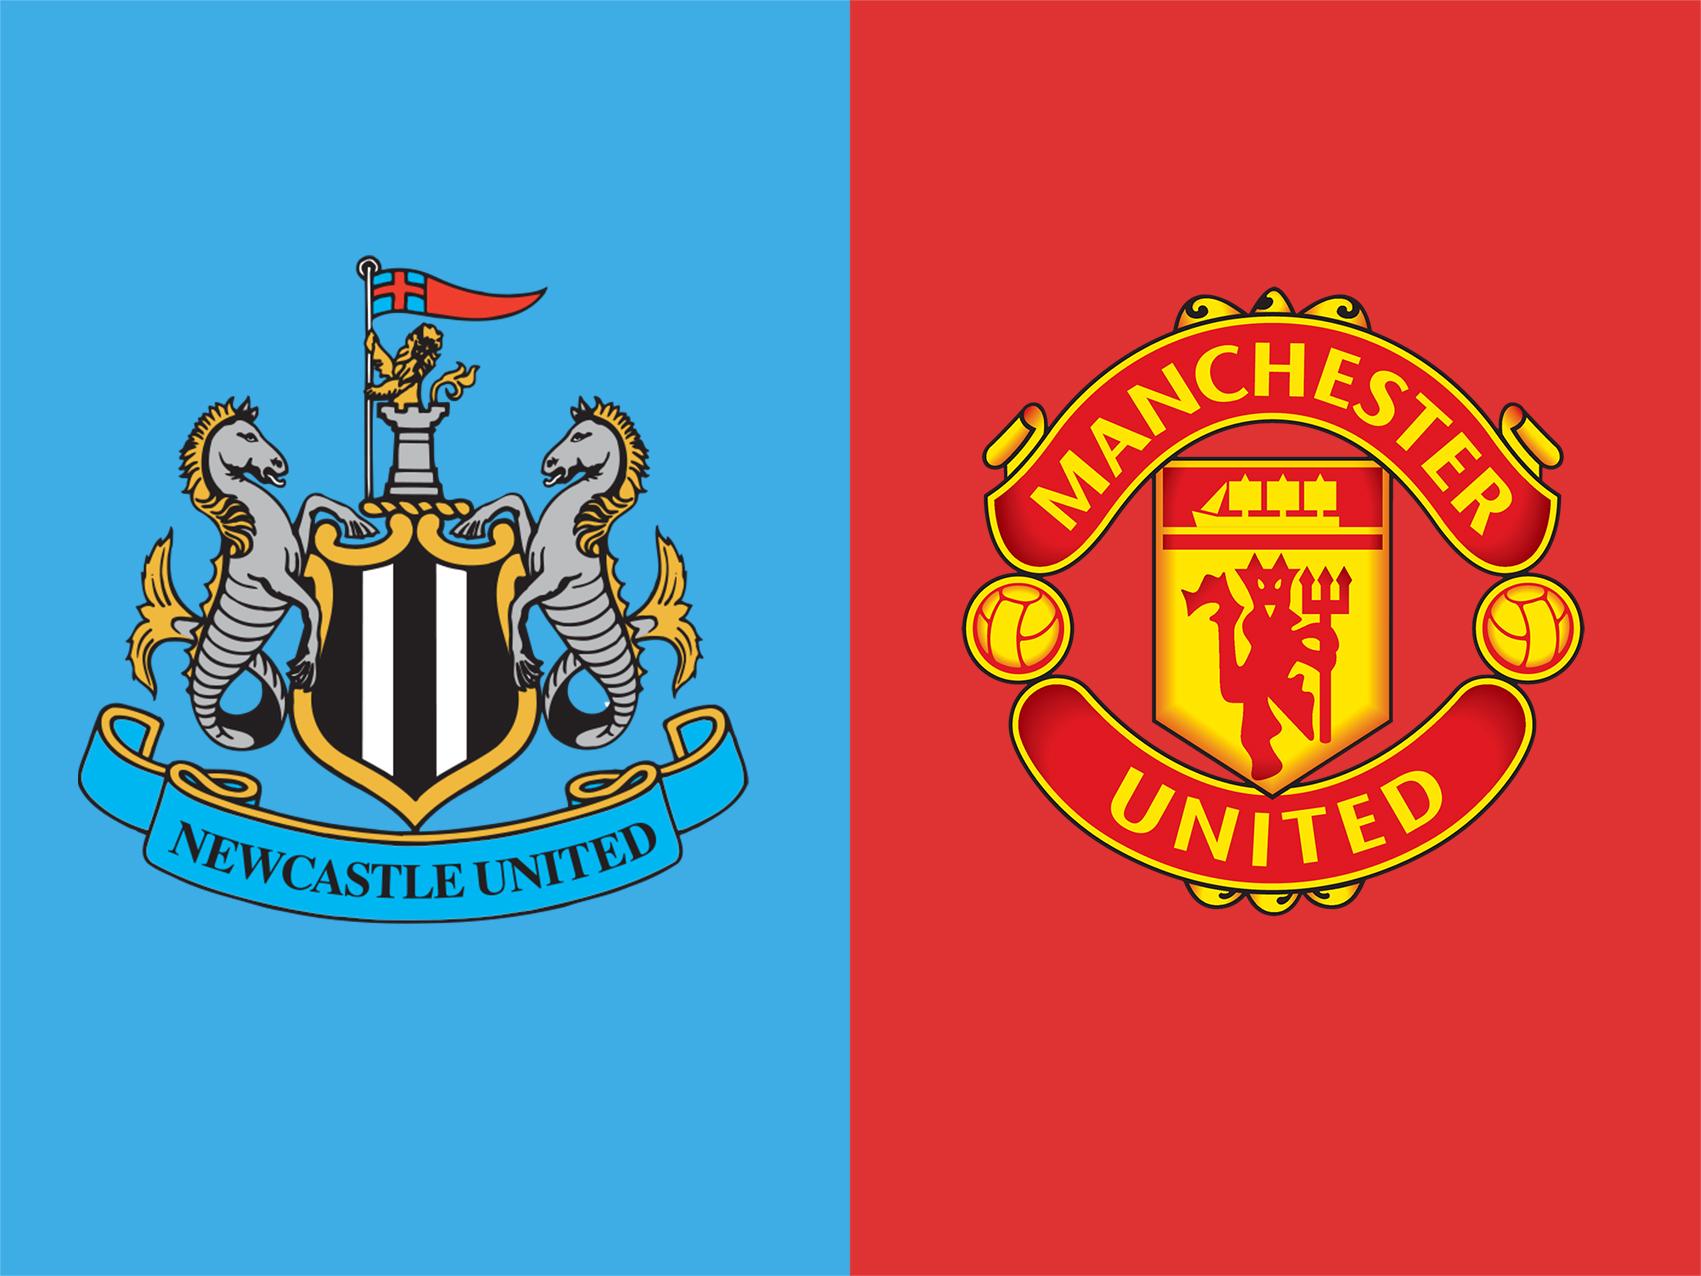 soi-keo-ca-cuoc-bong-da-ngay-6-10-newcastle-vs-manchester-united-xoa-dop-san-khach-b9 1